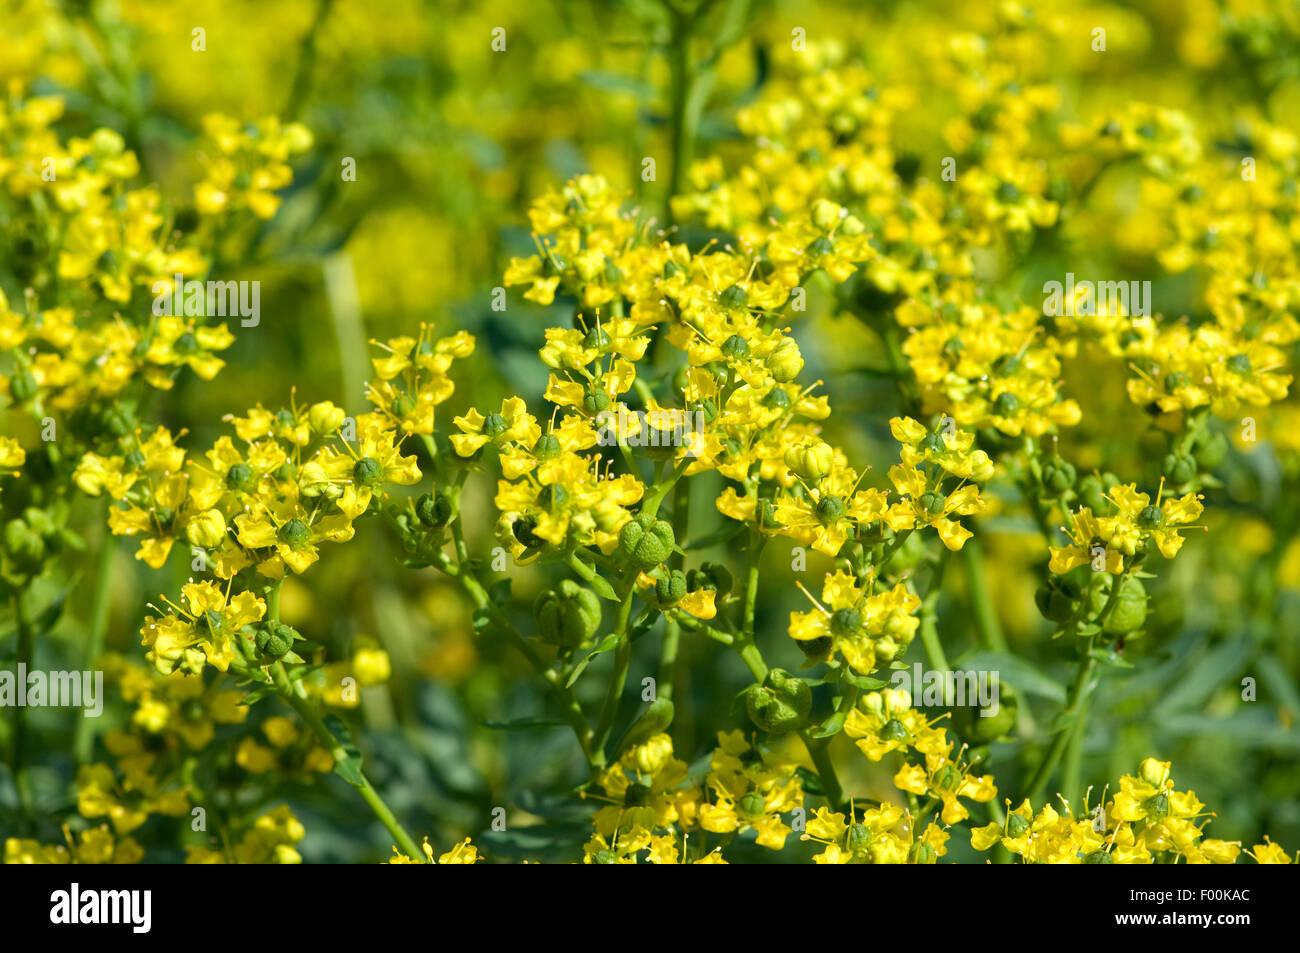 Weinraute, Ruta, graveolens, Raute, Gewuerzpgflanze, heilpflanze - Stock Image